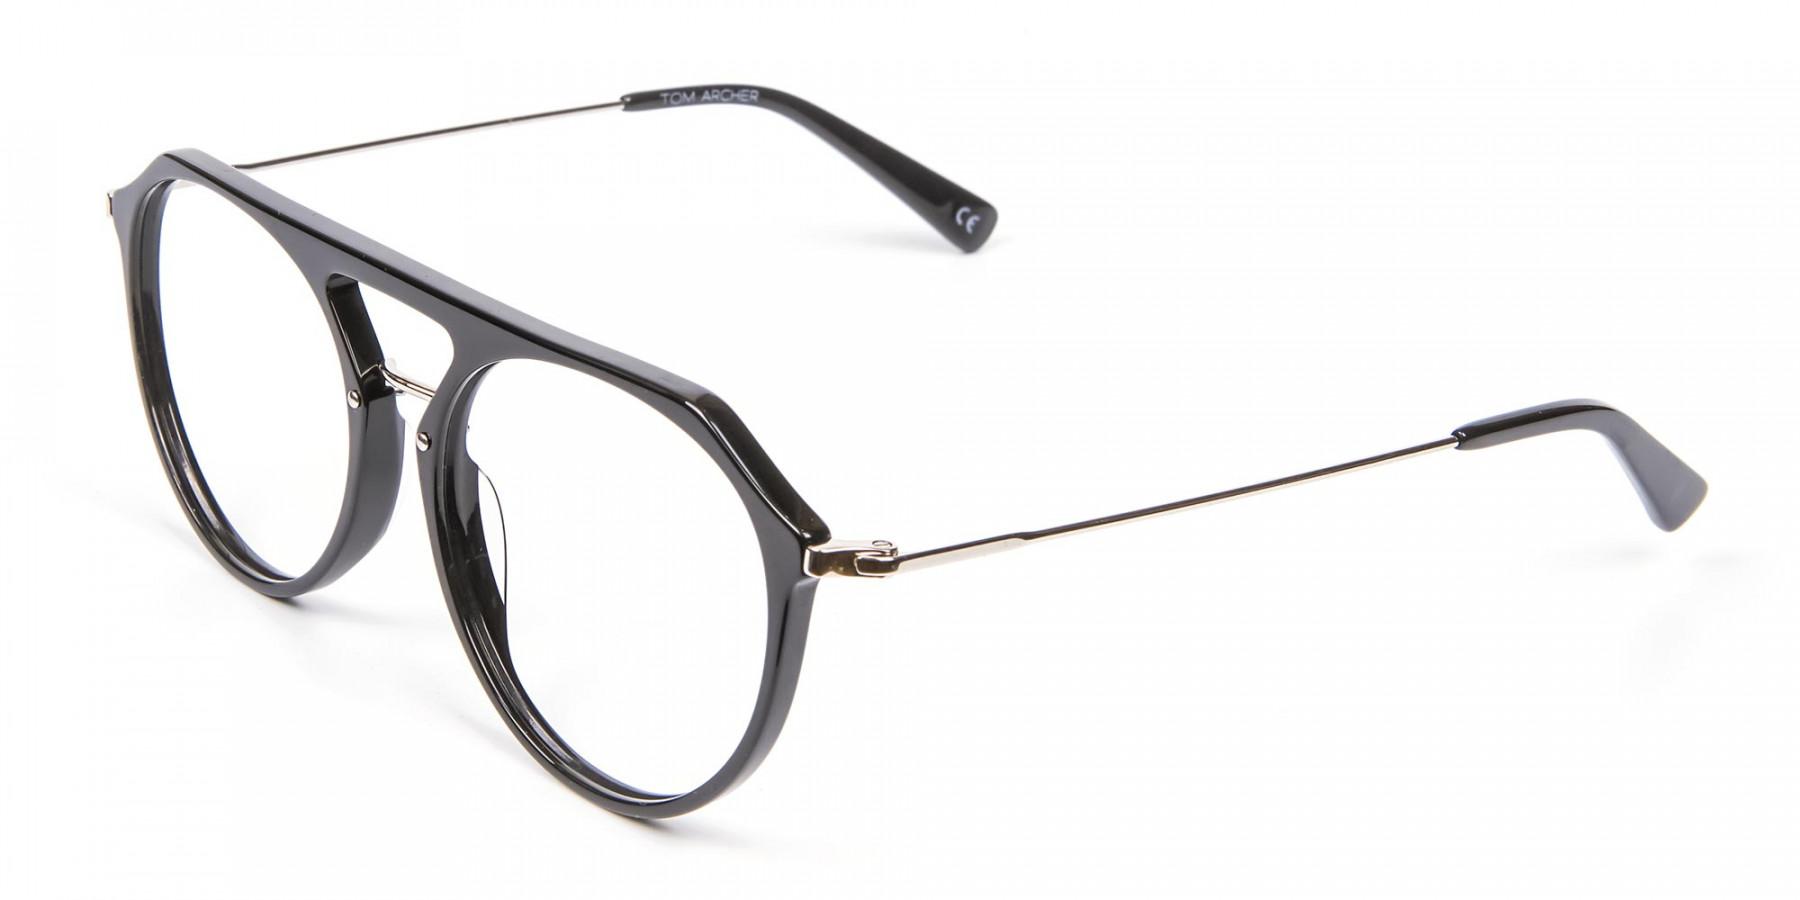 Hybrid Designer Glasses in Round and Angles -1